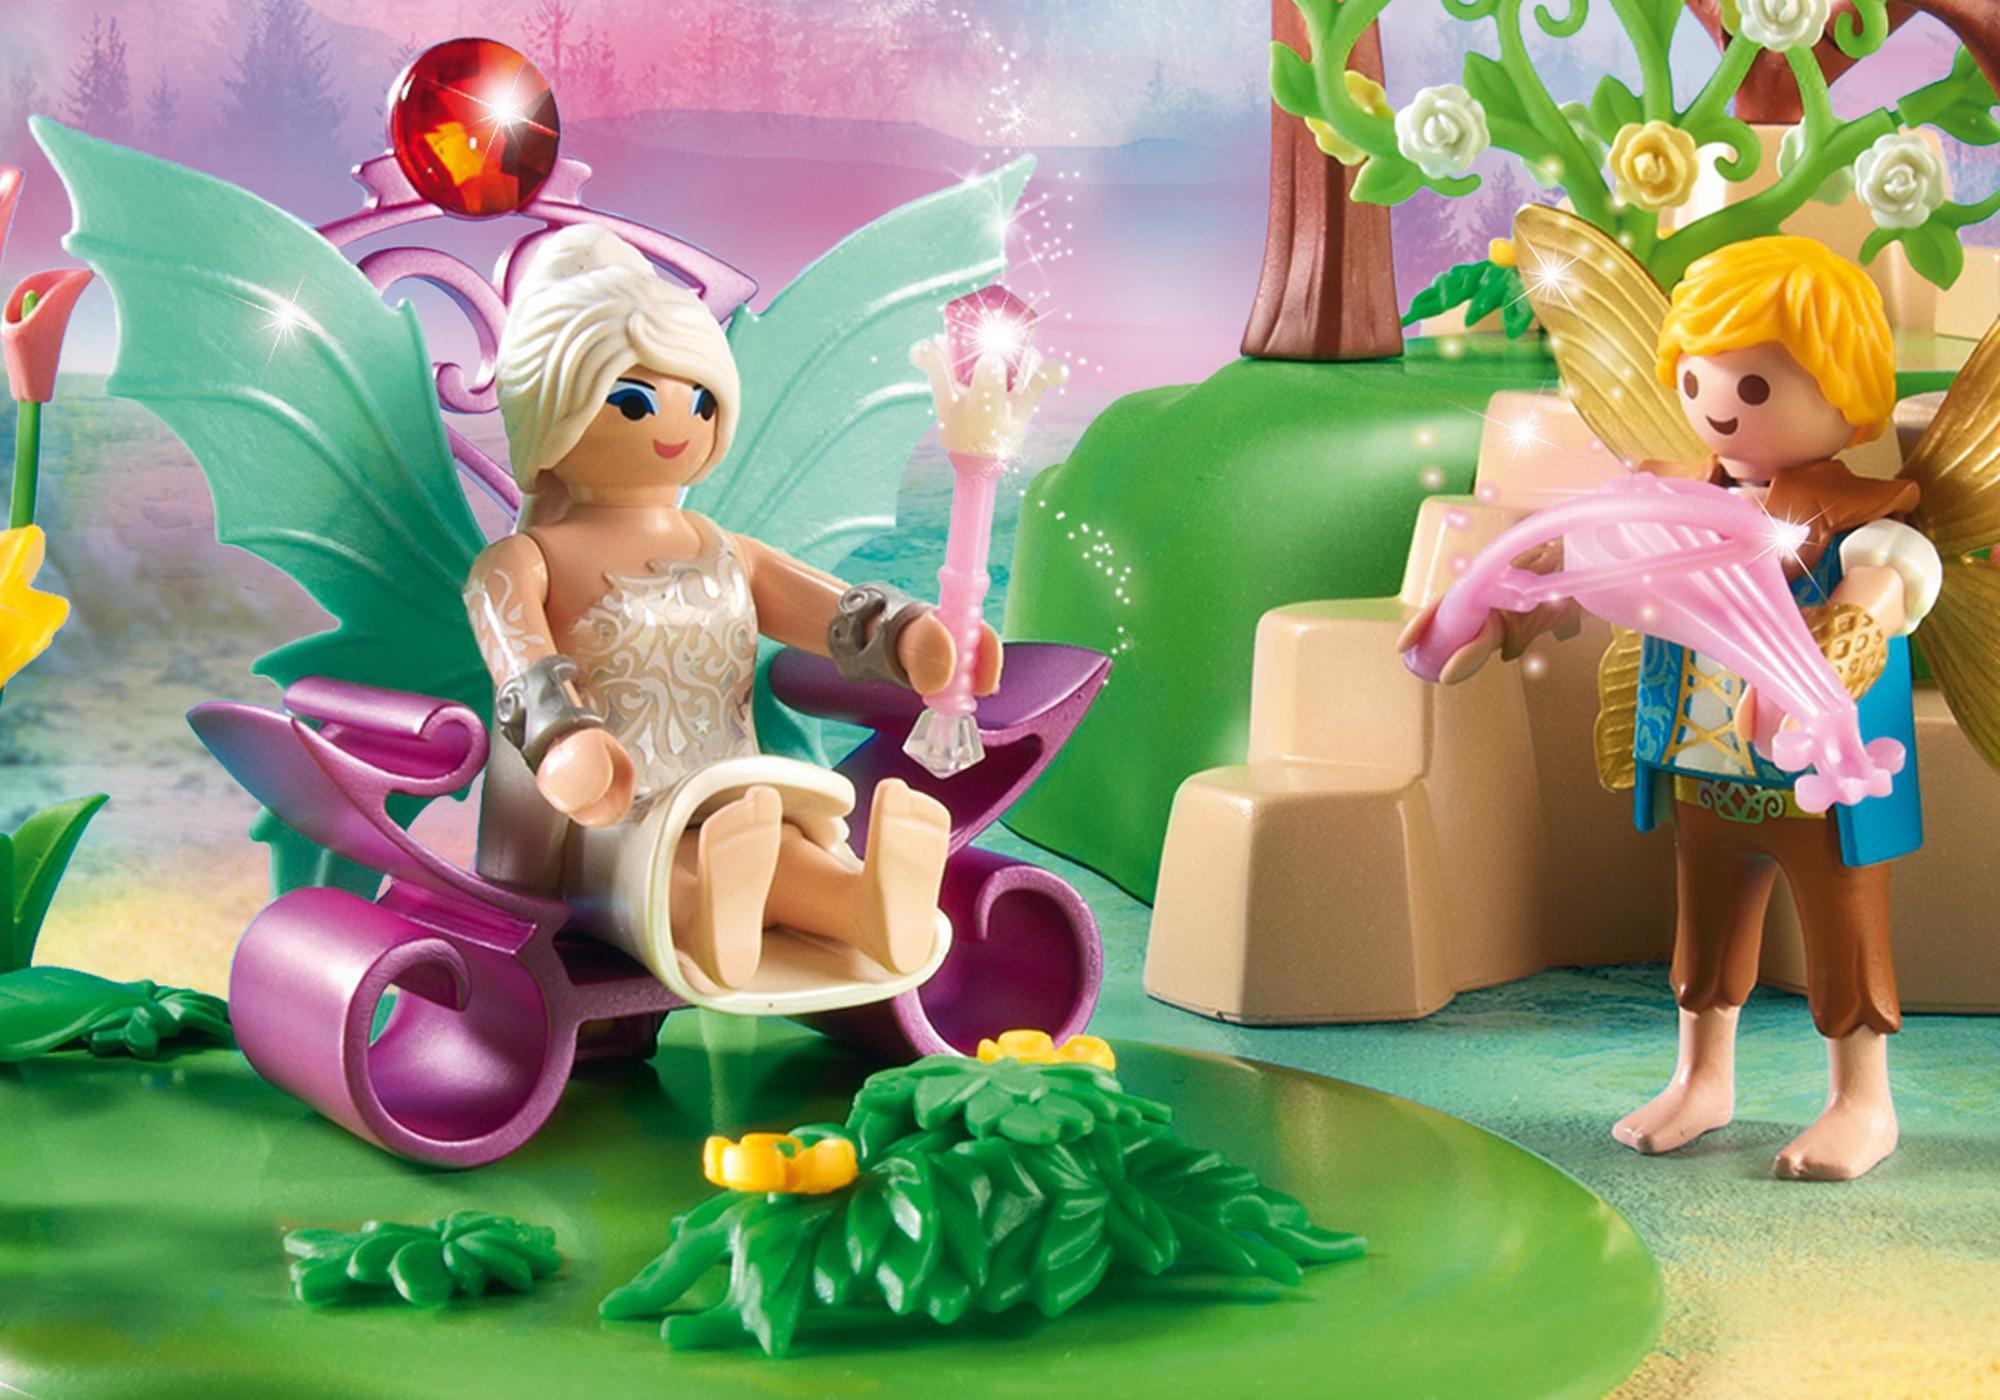 http://media.playmobil.com/i/playmobil/9132_product_extra6/Magical Fairy Forest